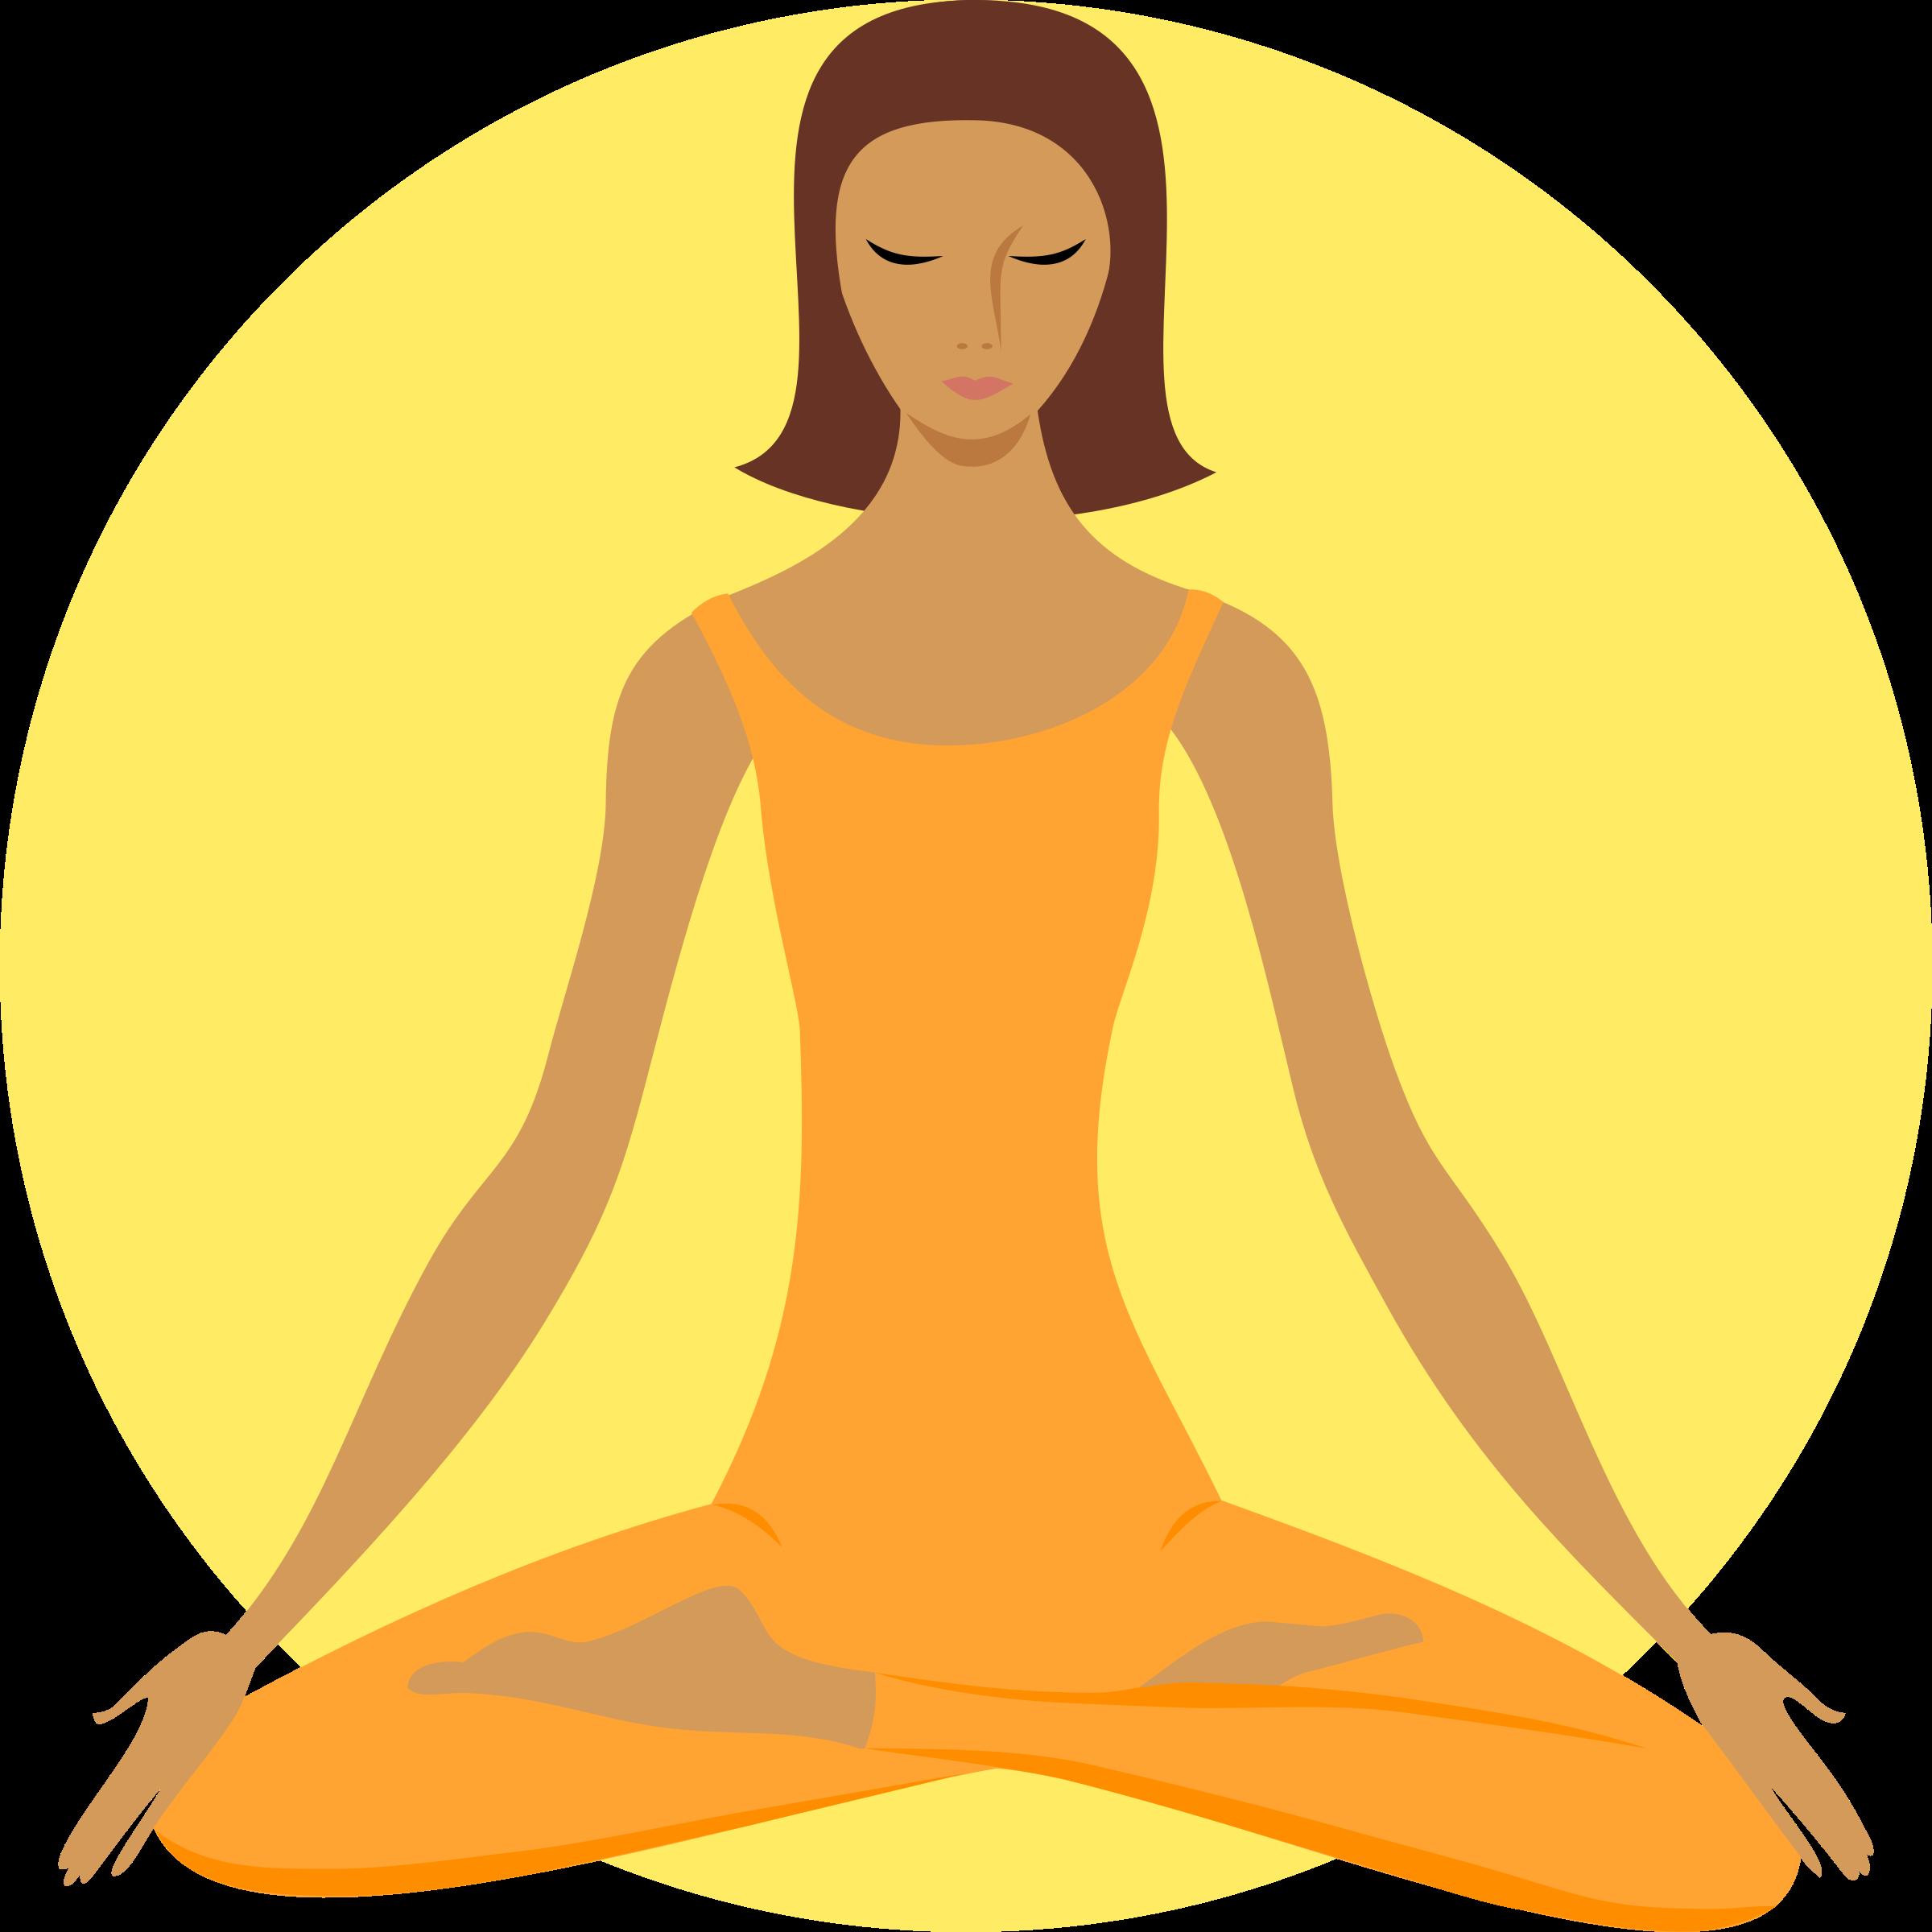 Meditation clipart Meditating Buddhist Clipart Buddhist Meditating